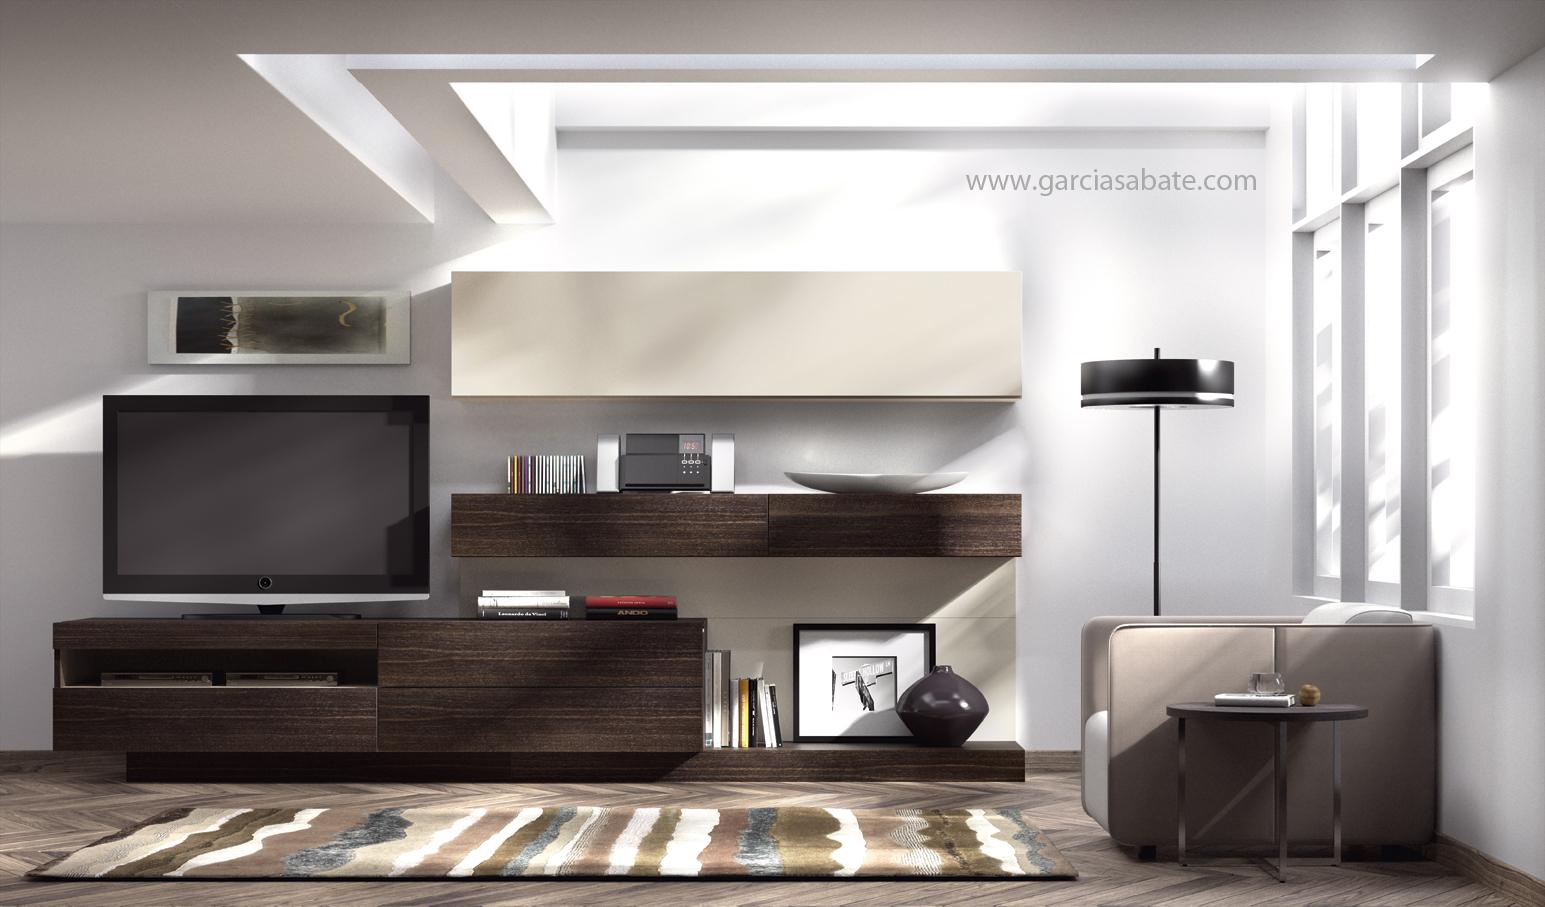 Muebles de salon modernos italianos top mueble de saln for Muebles salon diseno italiano